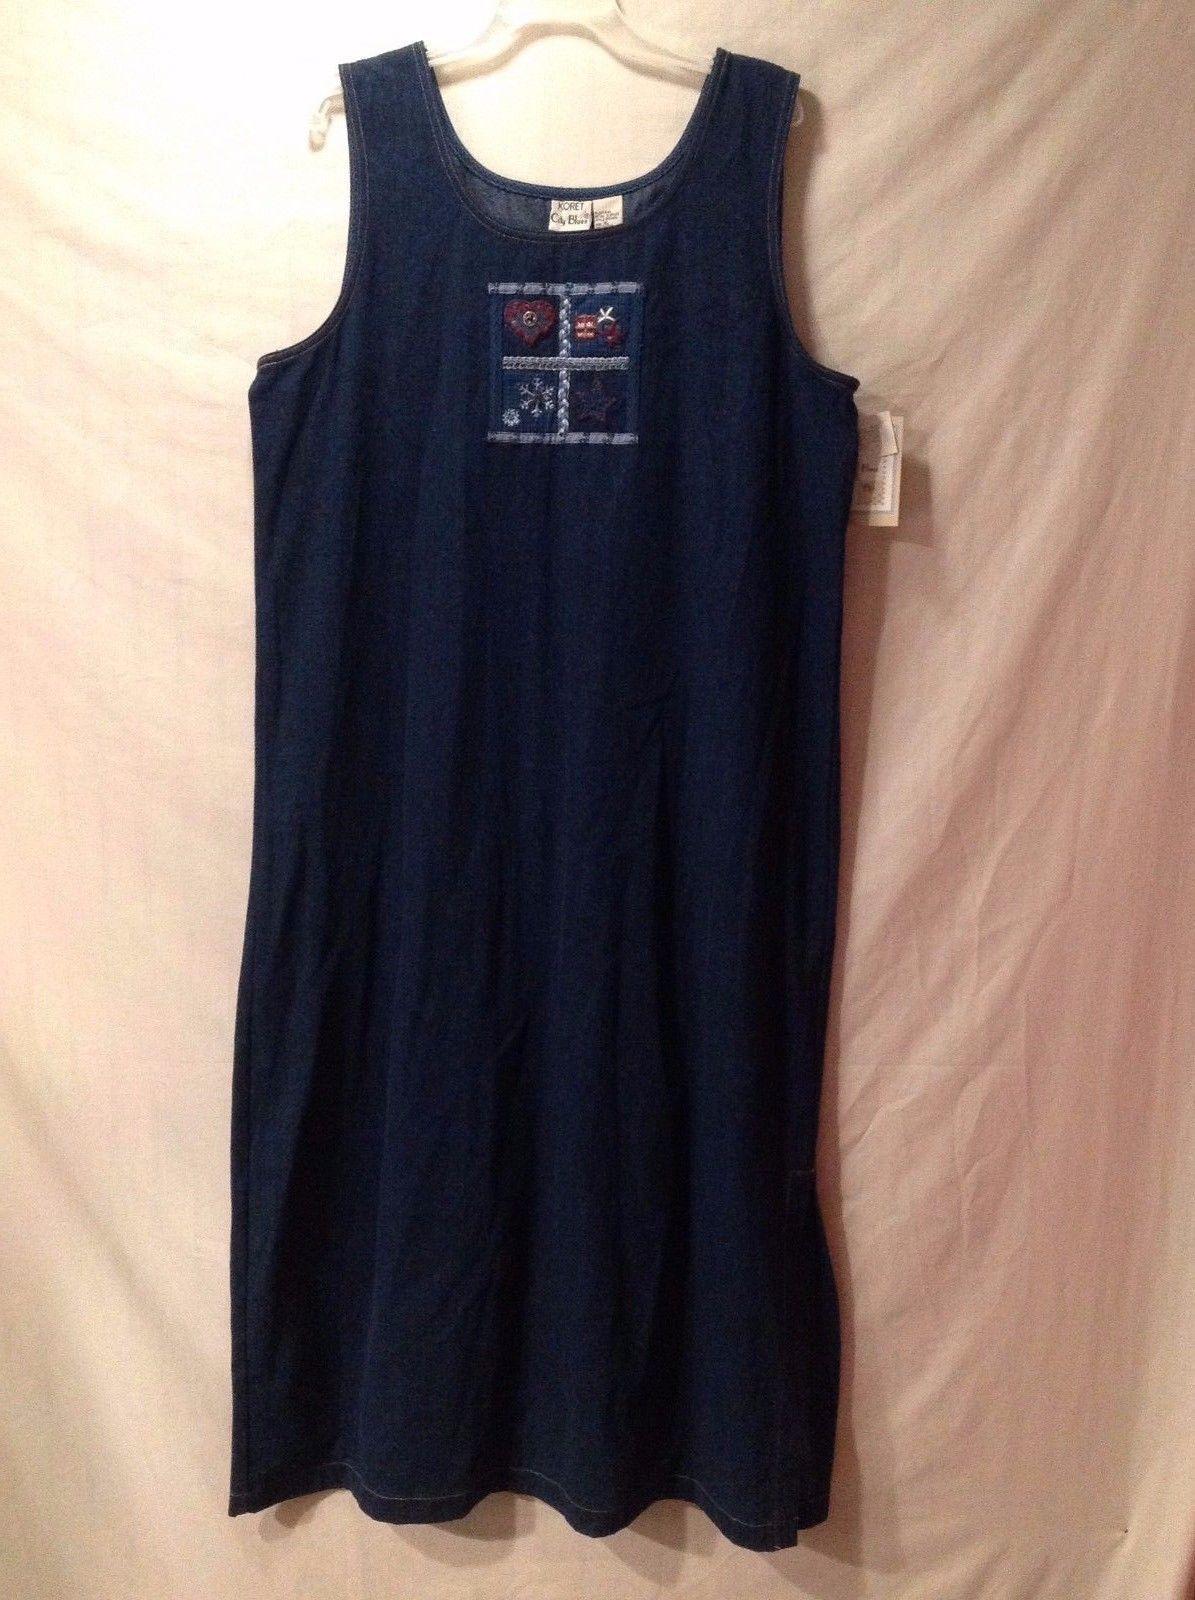 Koret City Blues Dark Denim Full Length Dress Sleeveless Pullover Size XL NWT